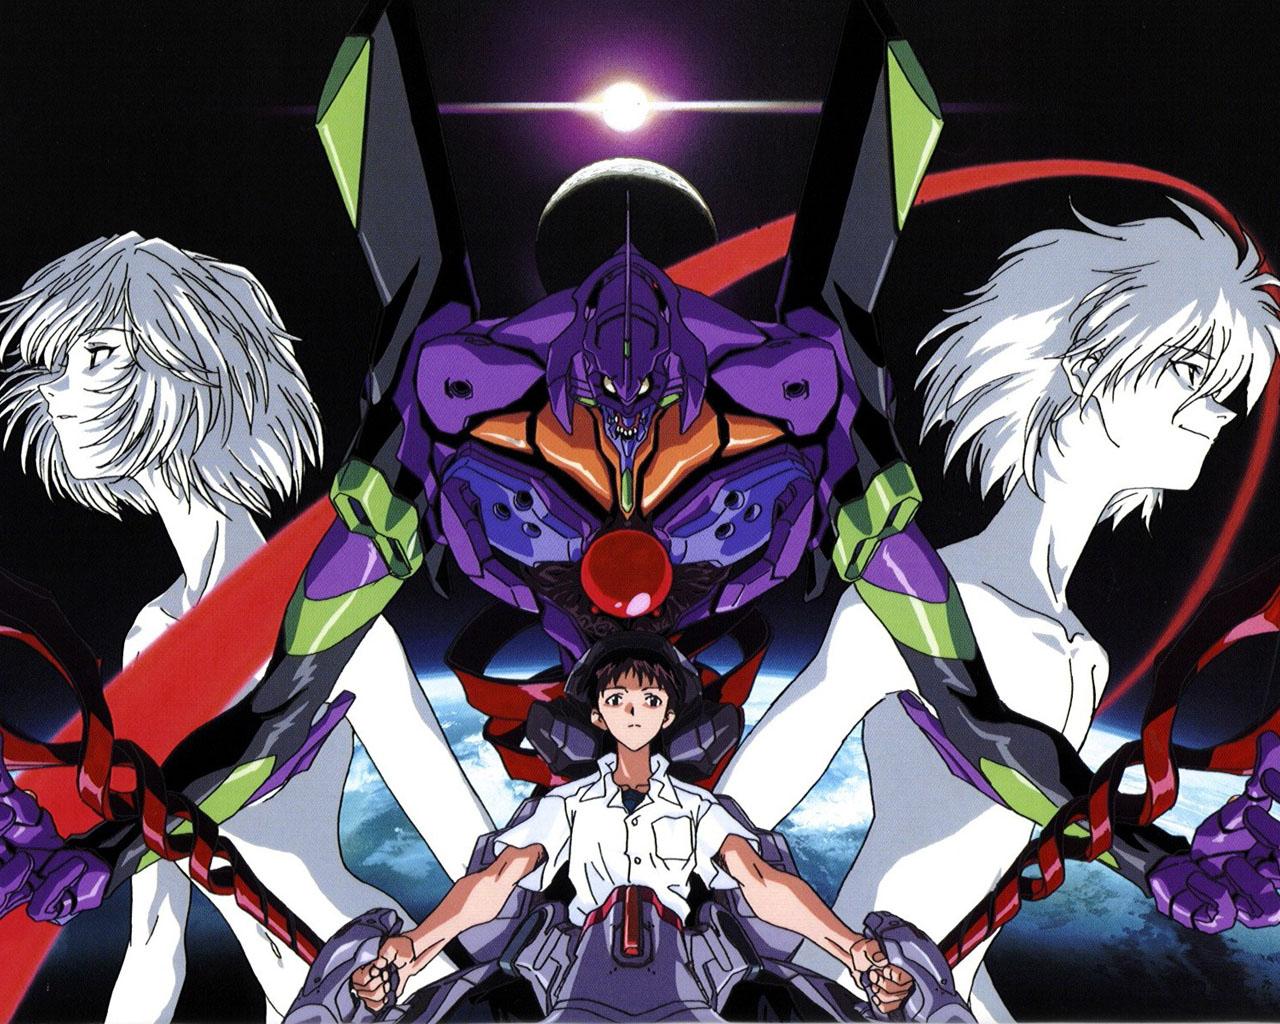 http://3.bp.blogspot.com/_FXzbebG1RO0/TVHQZ5RX2MI/AAAAAAAAAKk/QxwCVa7FjmI/s1600/neon-genesis-evangelion-shinji-ikari-mecha-wallpaper.jpg